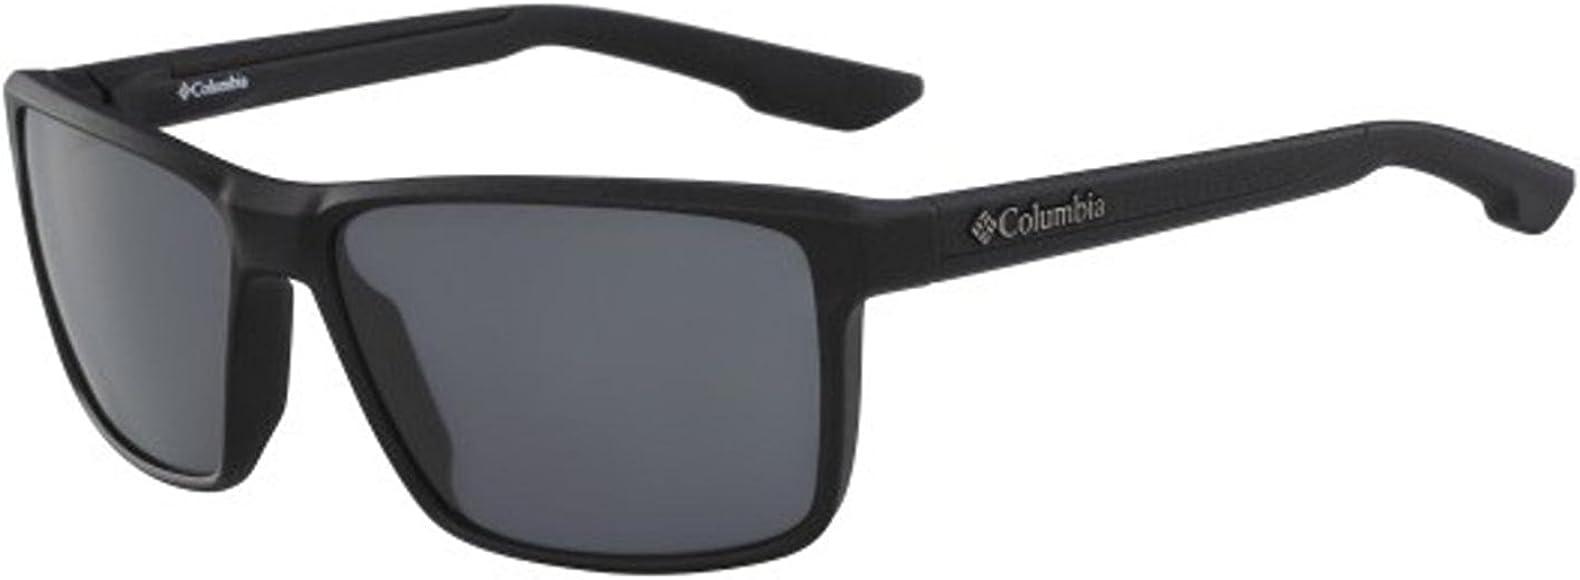 Amazon.com: anteojos de sol Columbia Hazen 418 mate ...